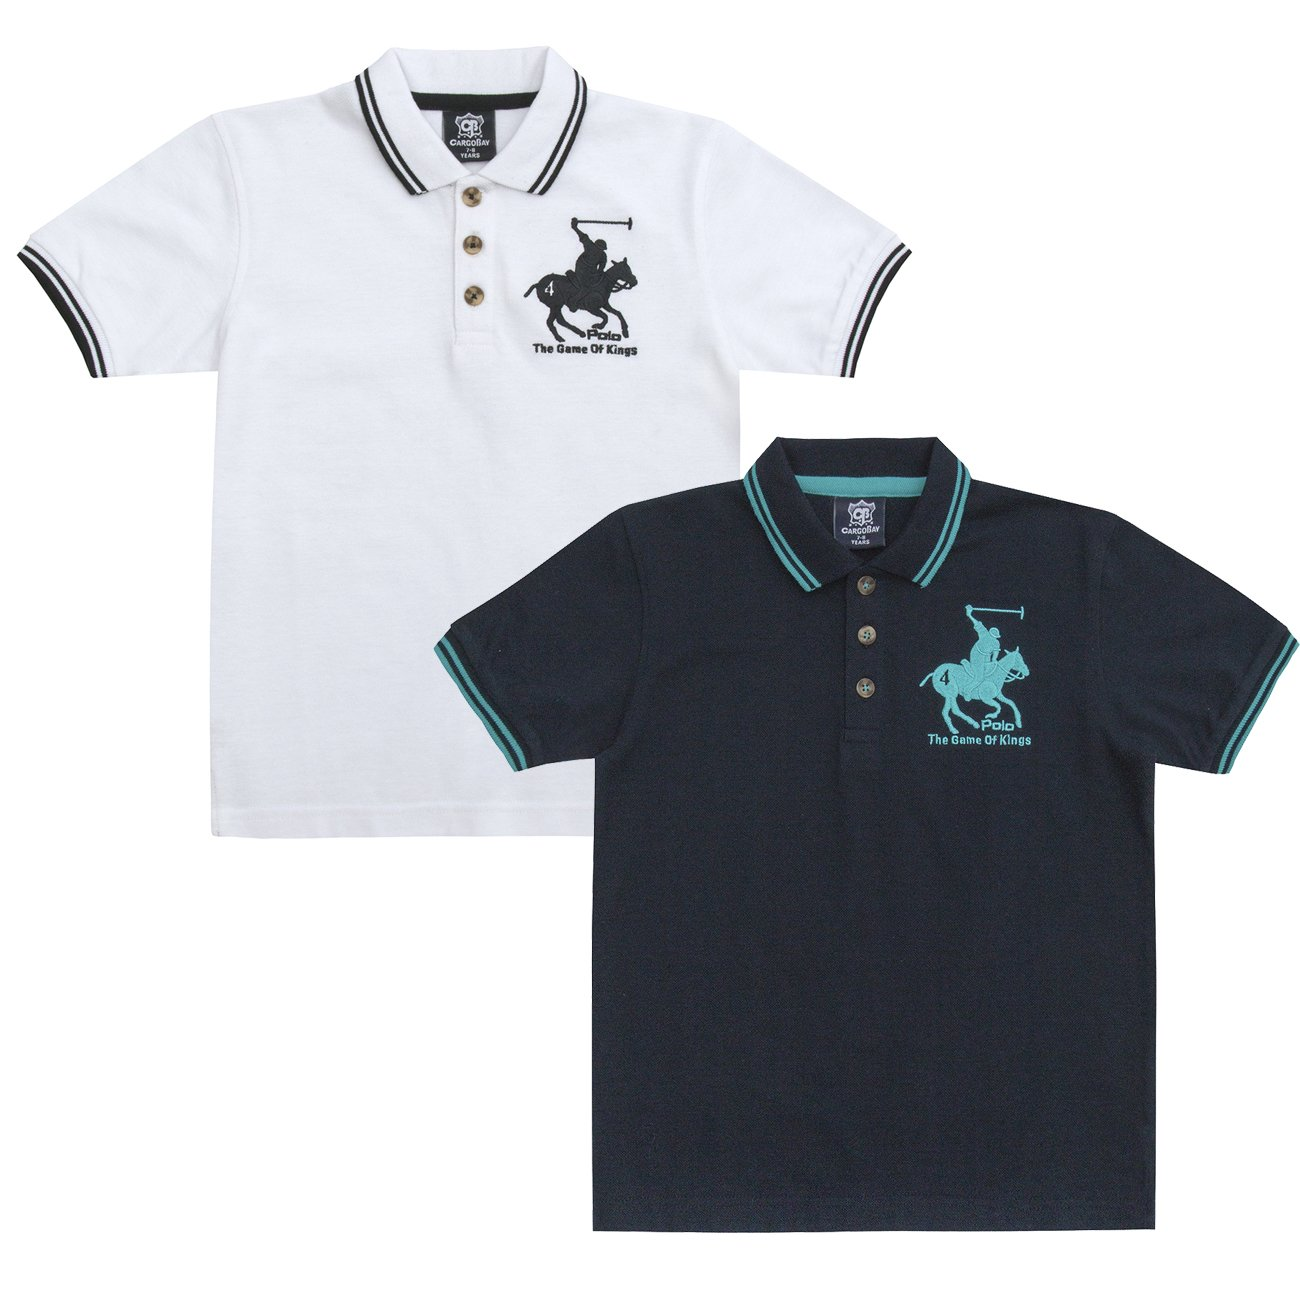 Cargo Bay Boys Logo Print Cotton Blend Polo T-Shirt with Contrasting Stripes